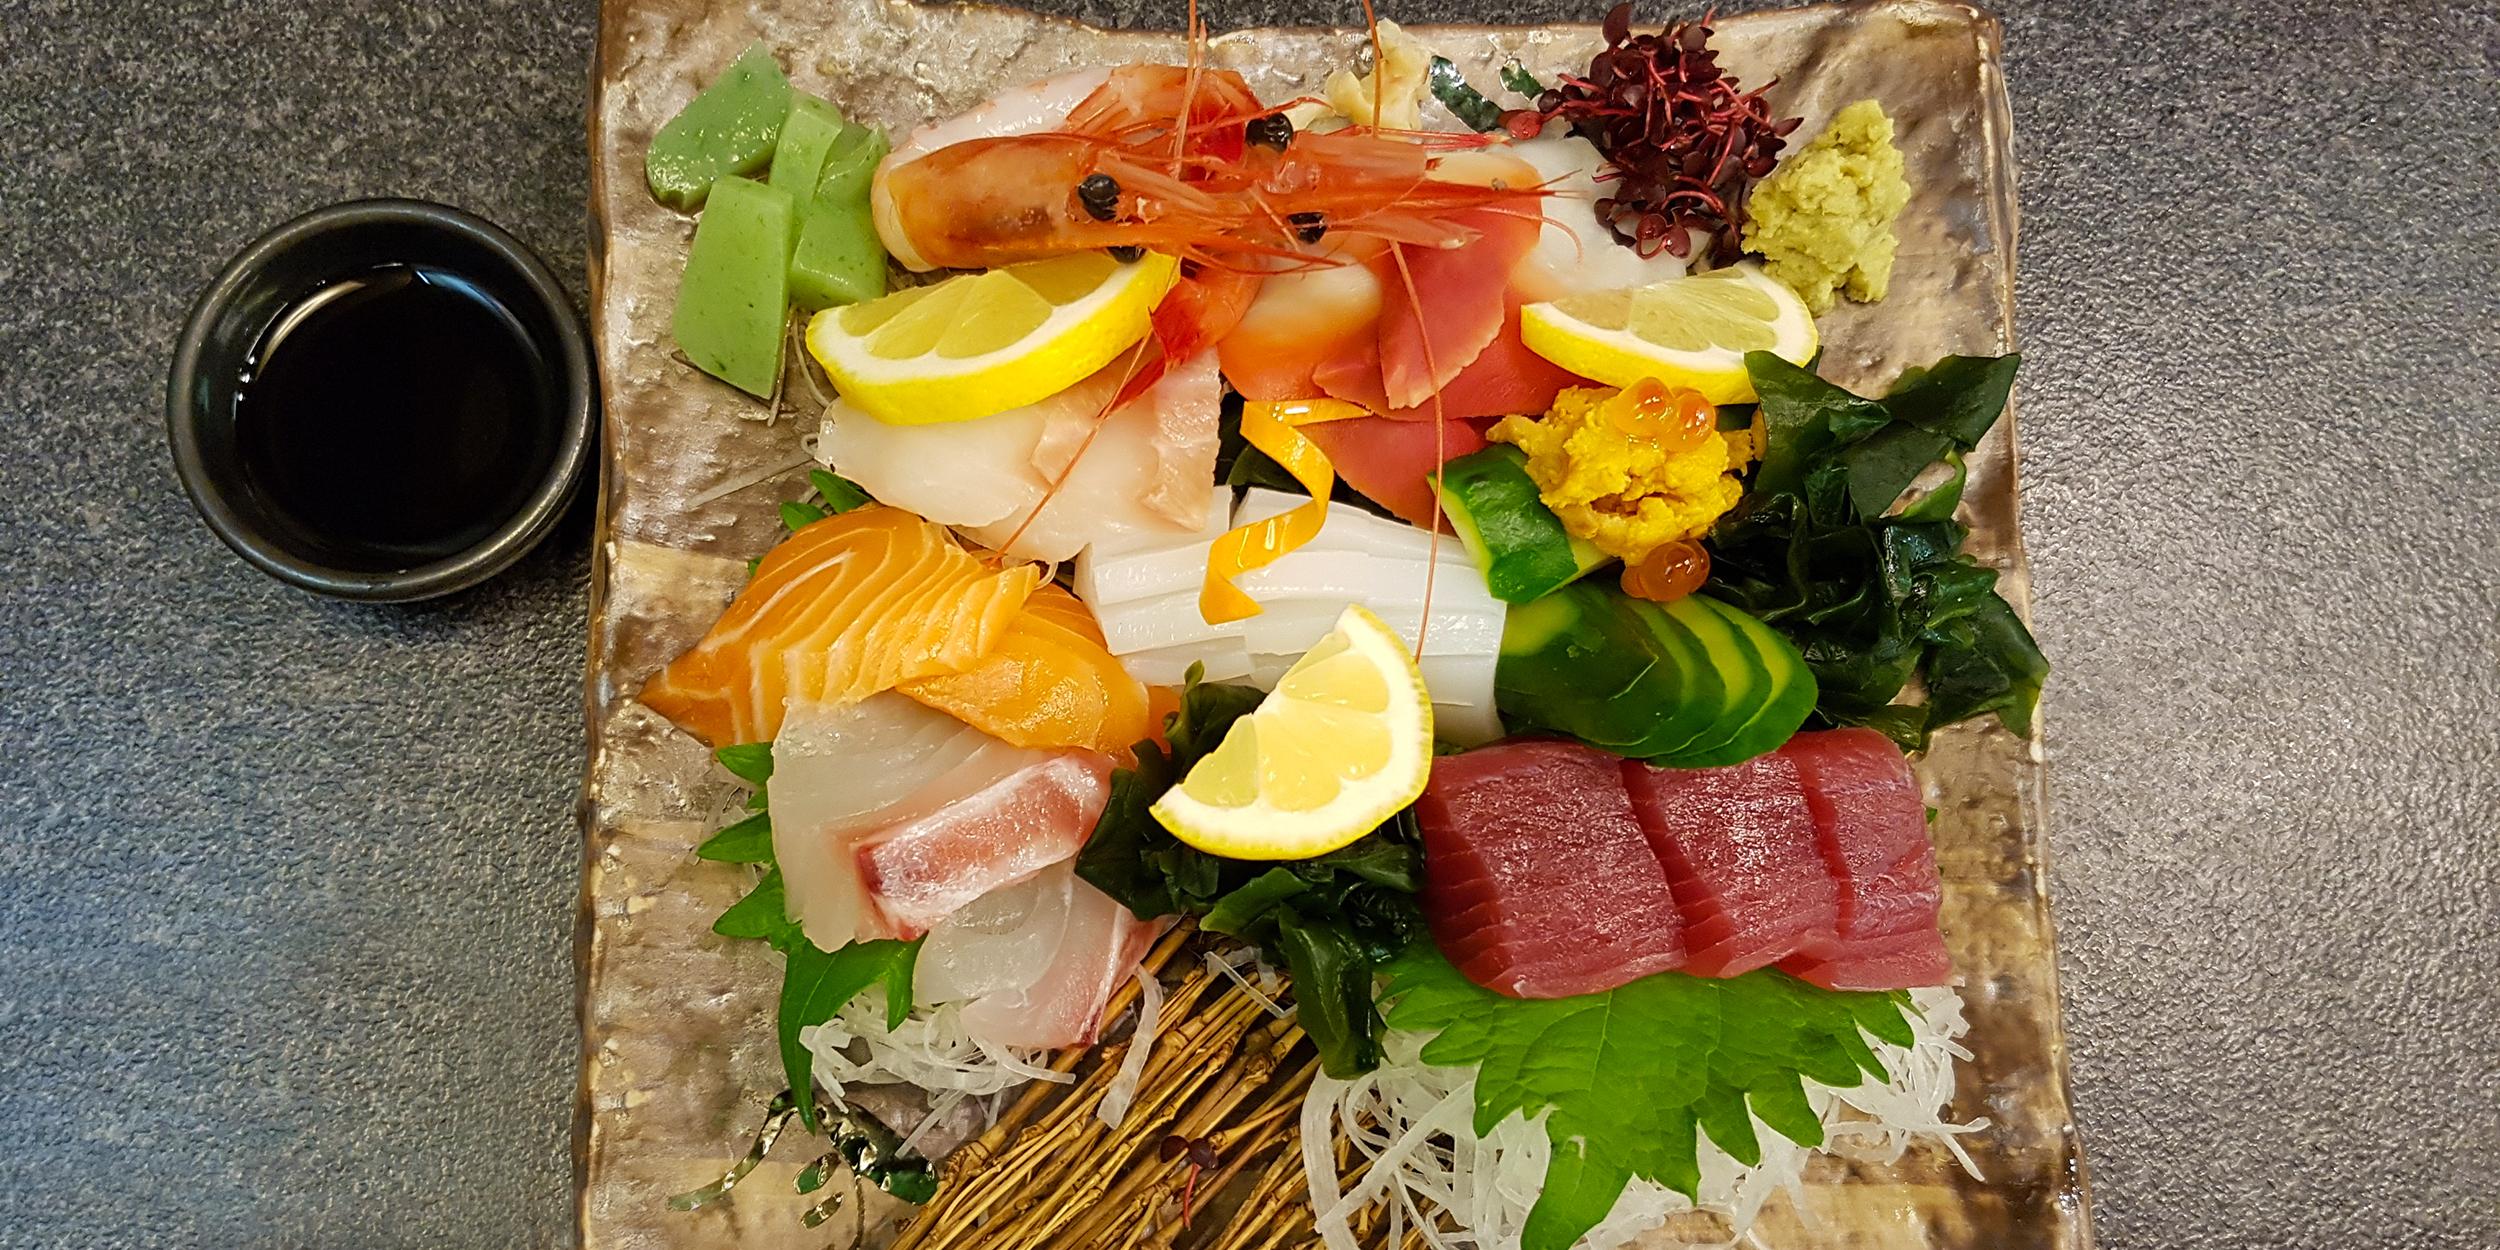 japan-food-osaka-sashimi-raw-fish